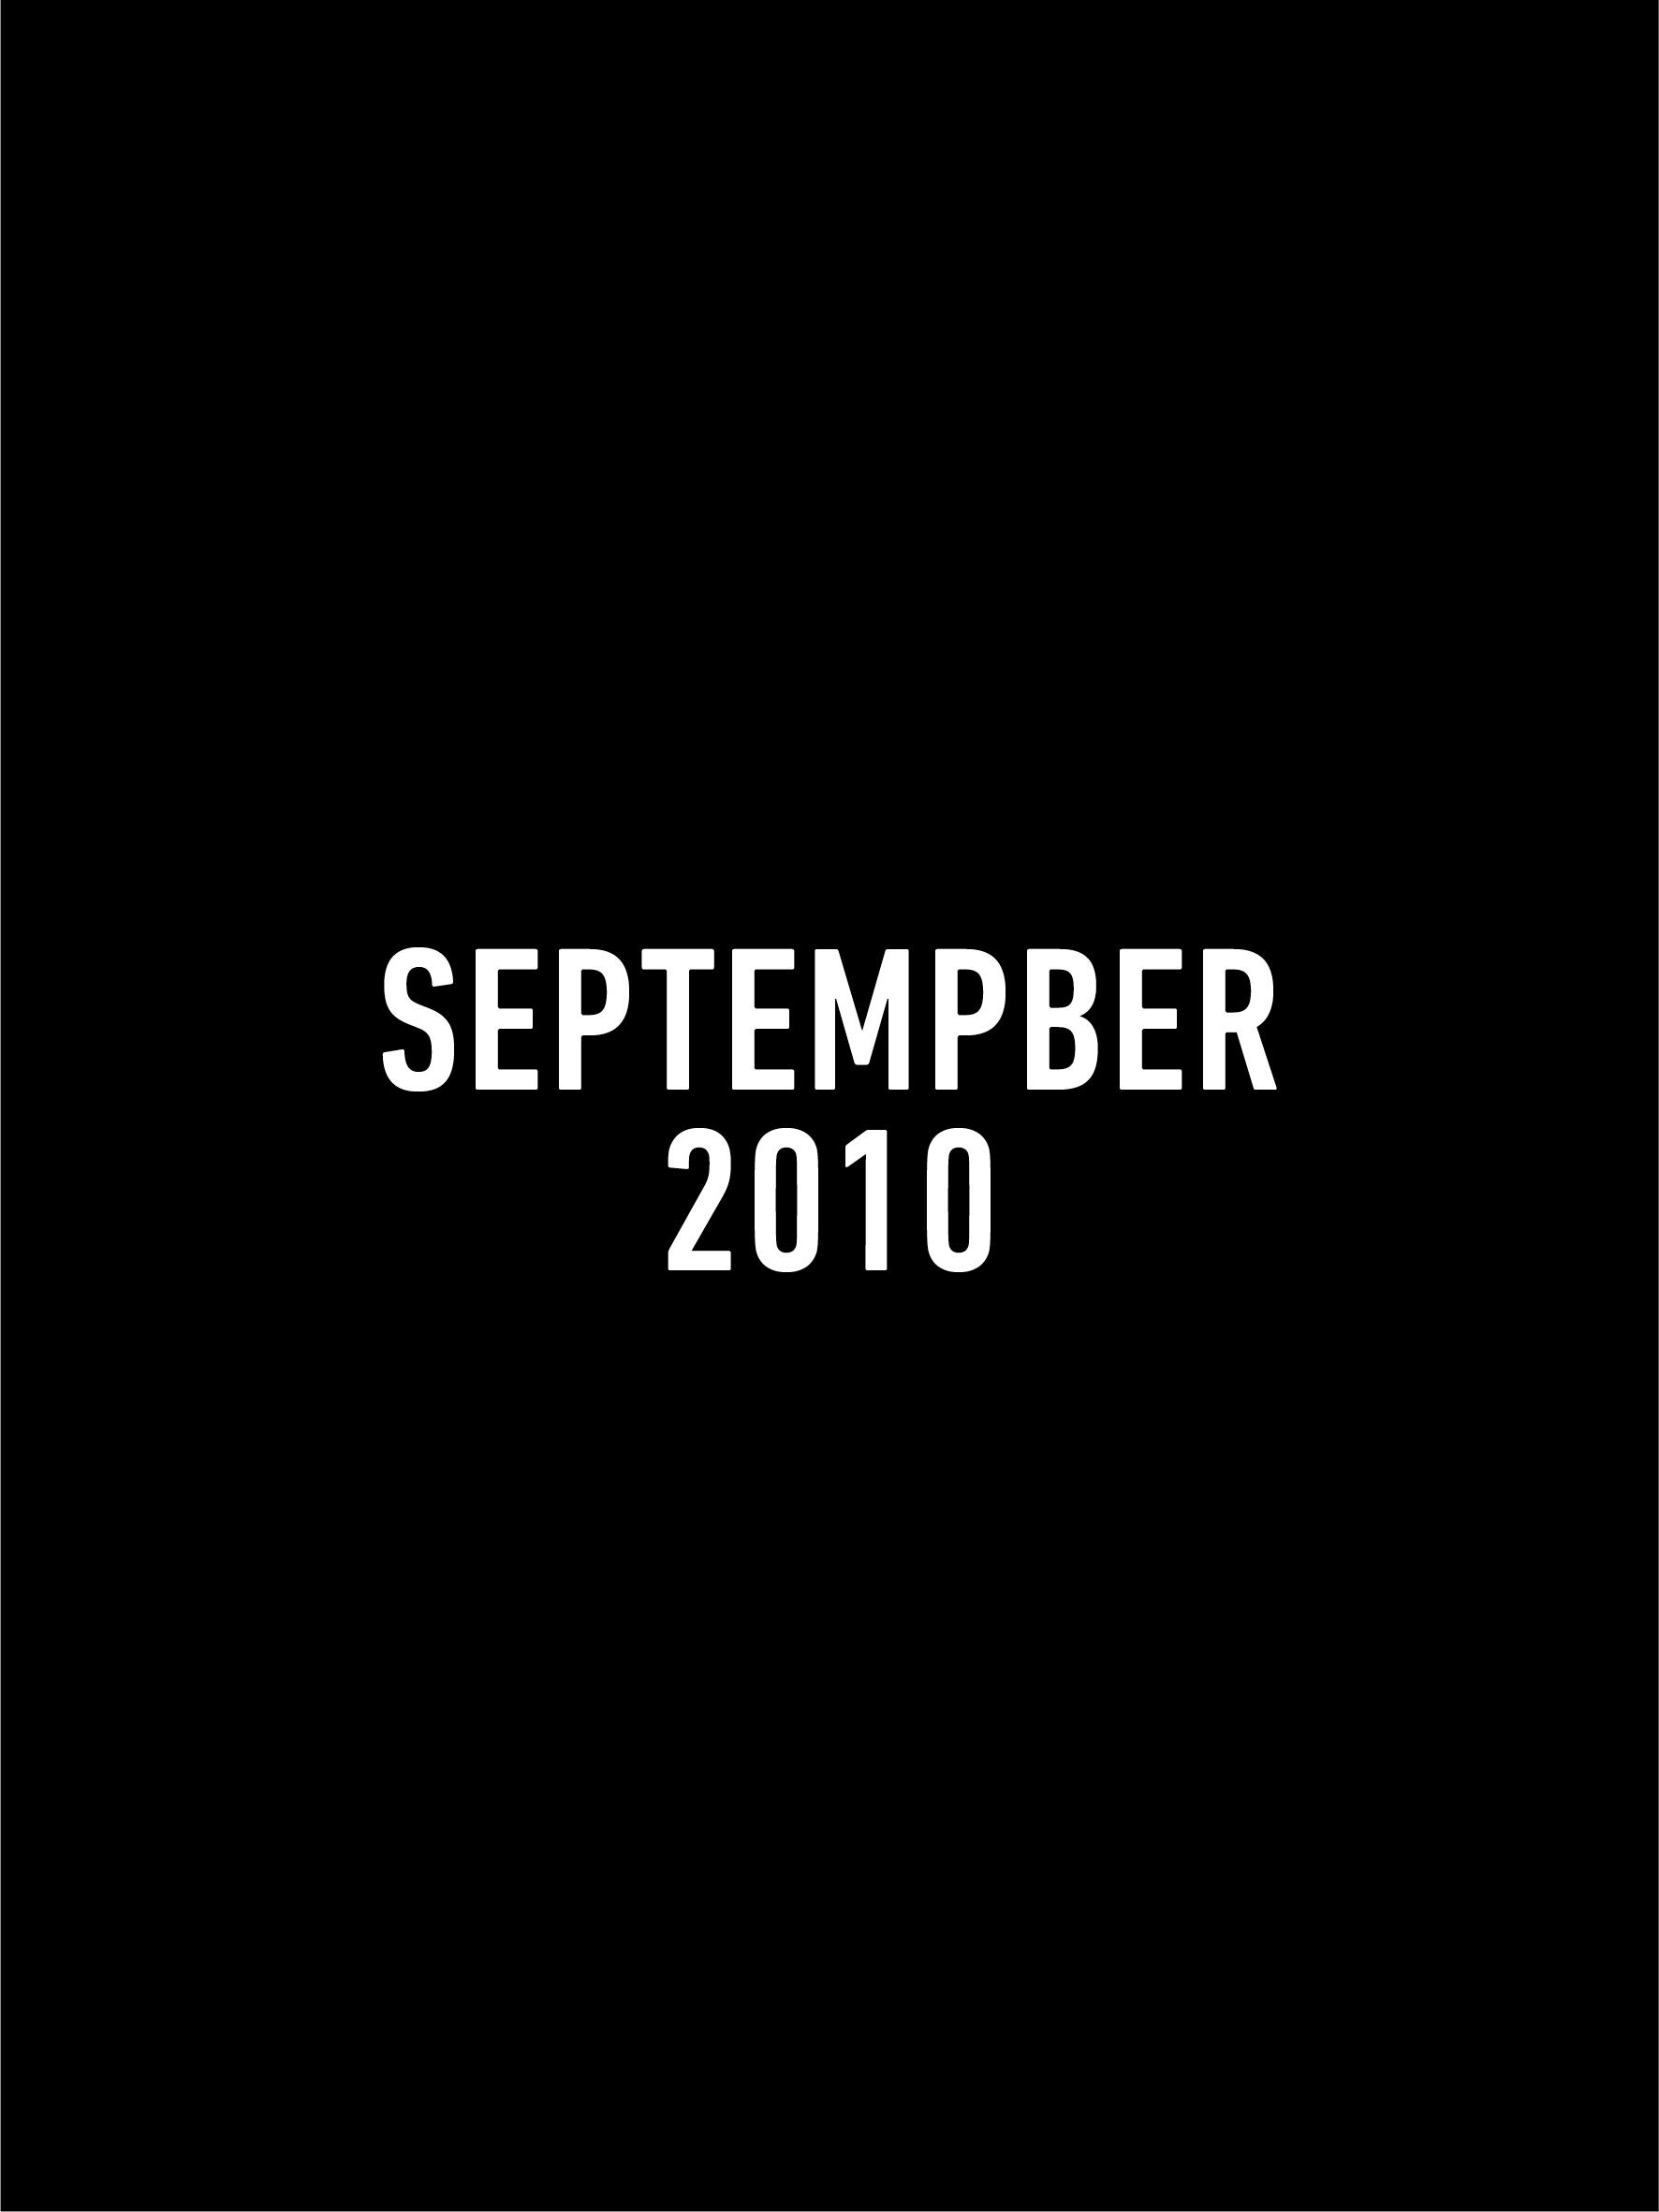 2010 monthly9.jpg